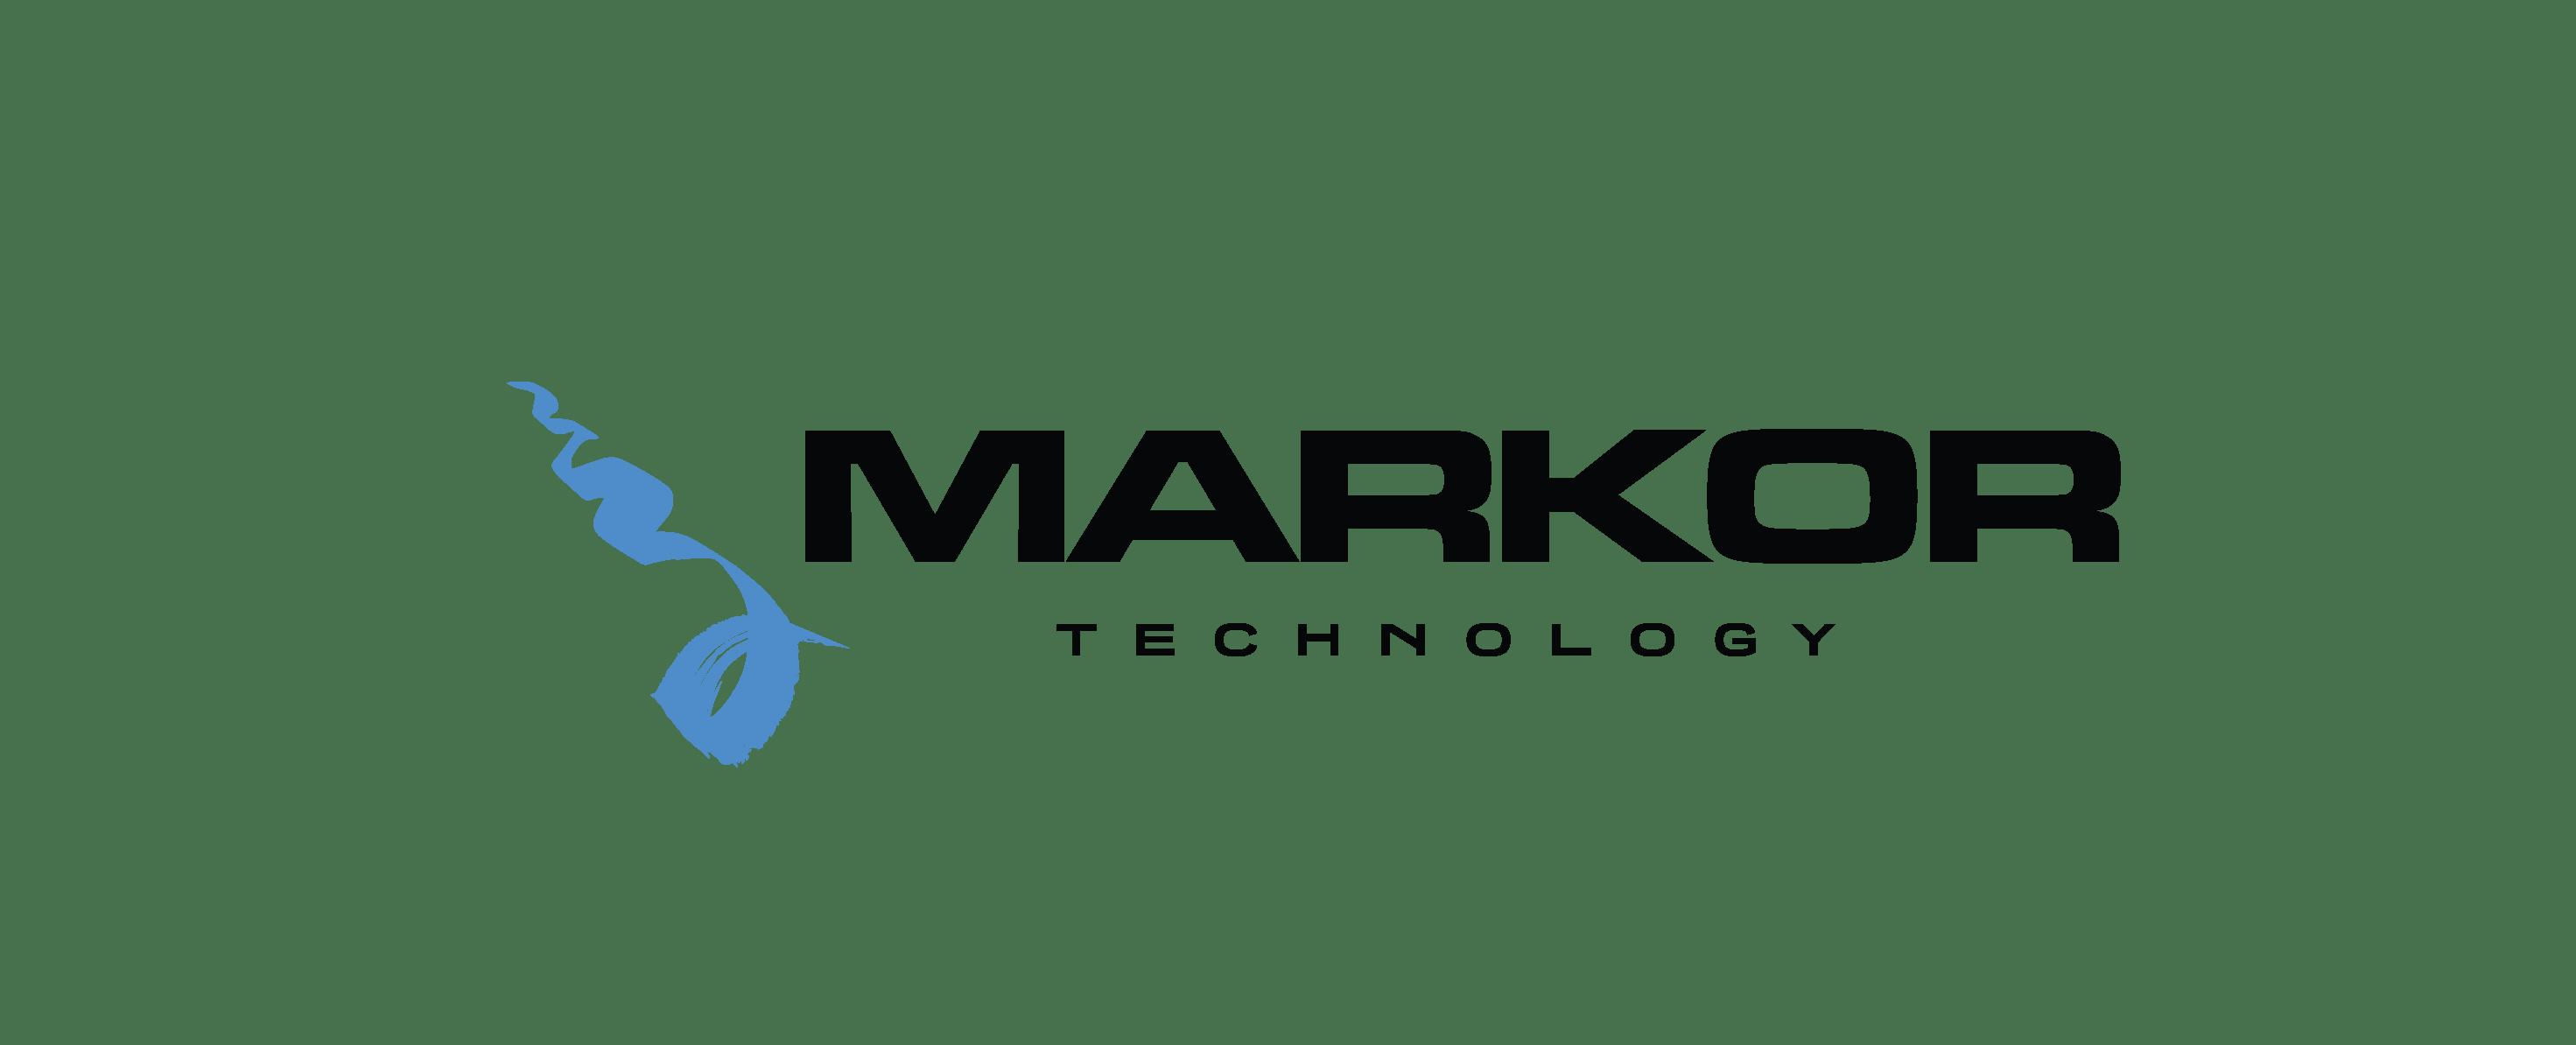 Markor Technology